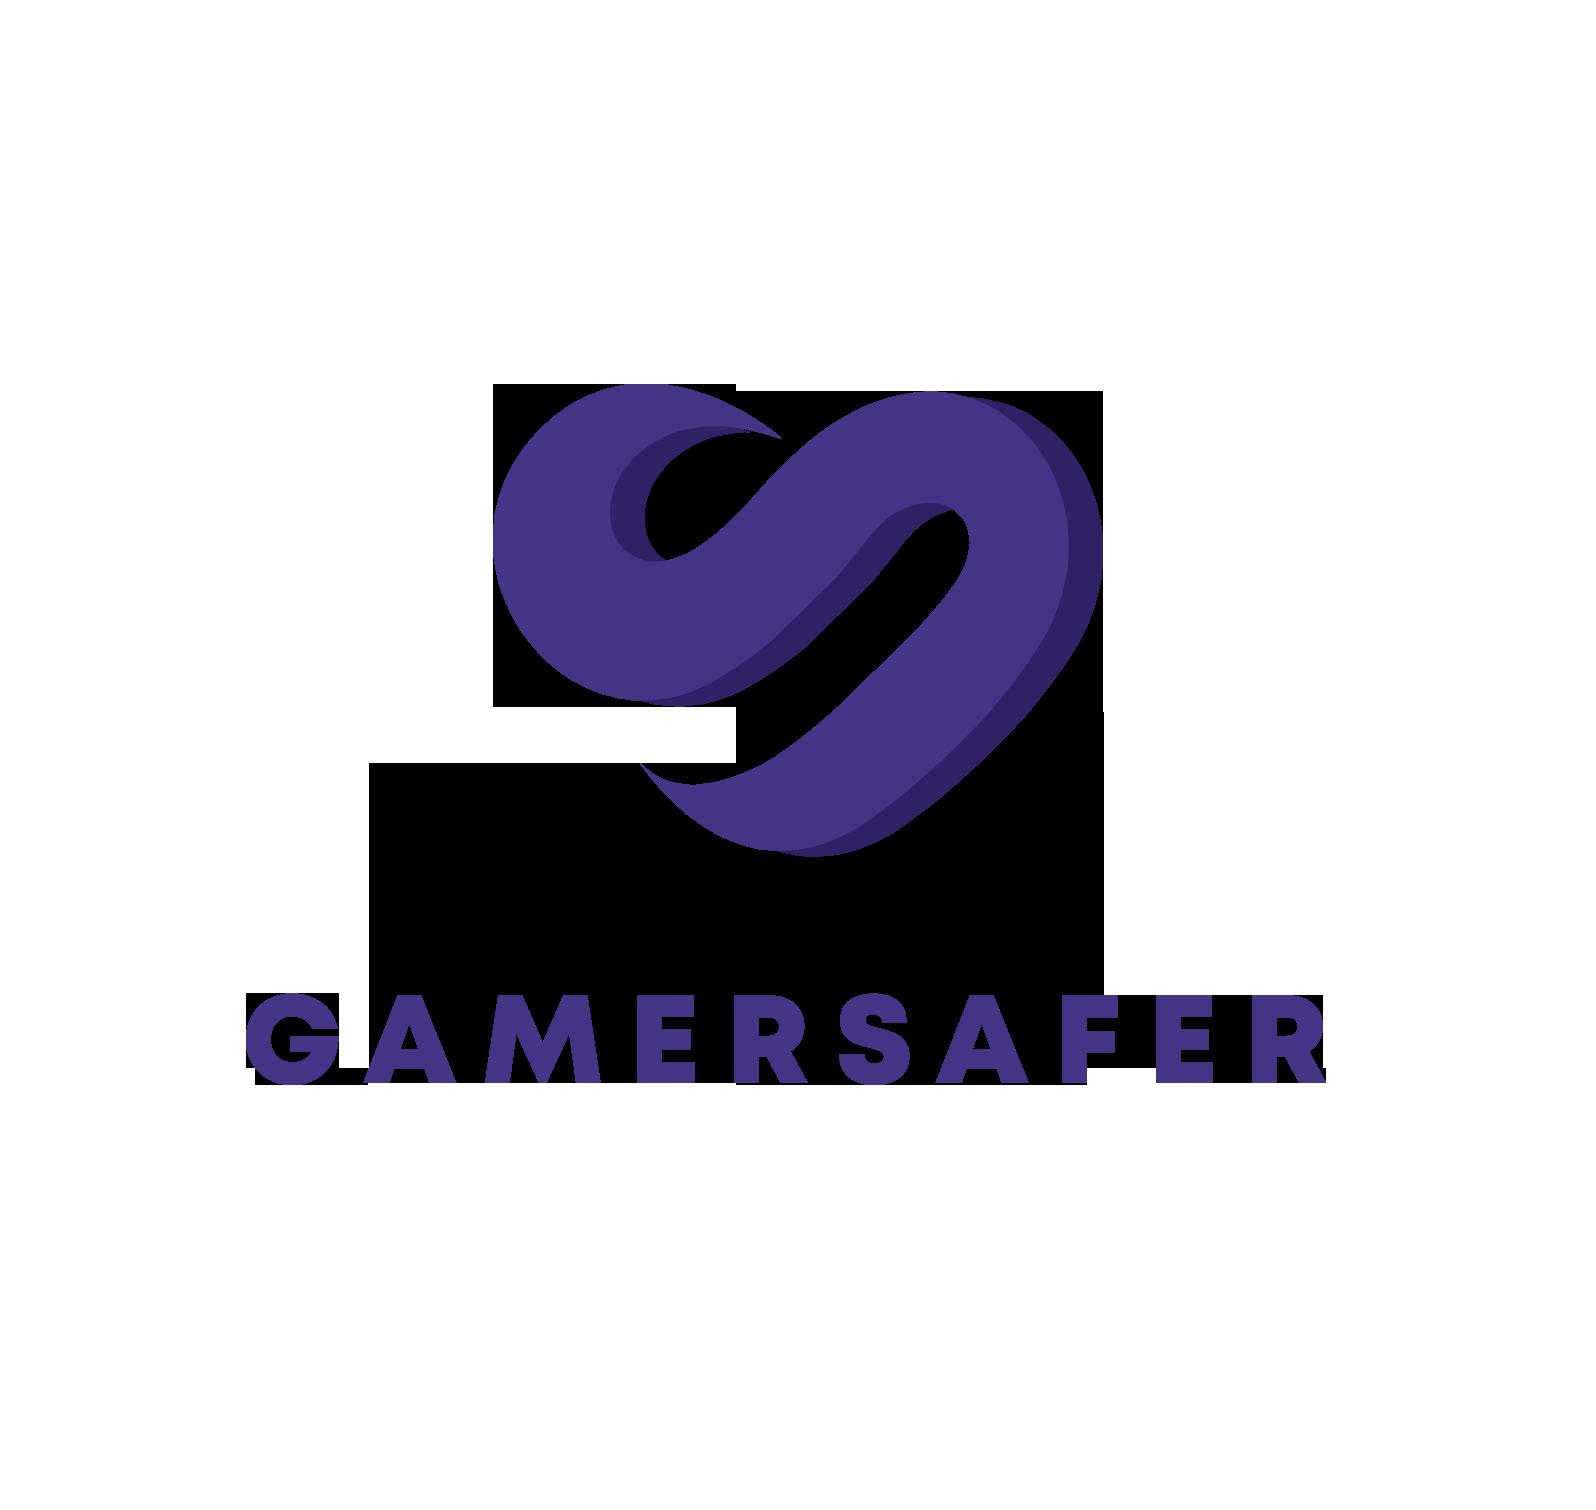 GamerSafer